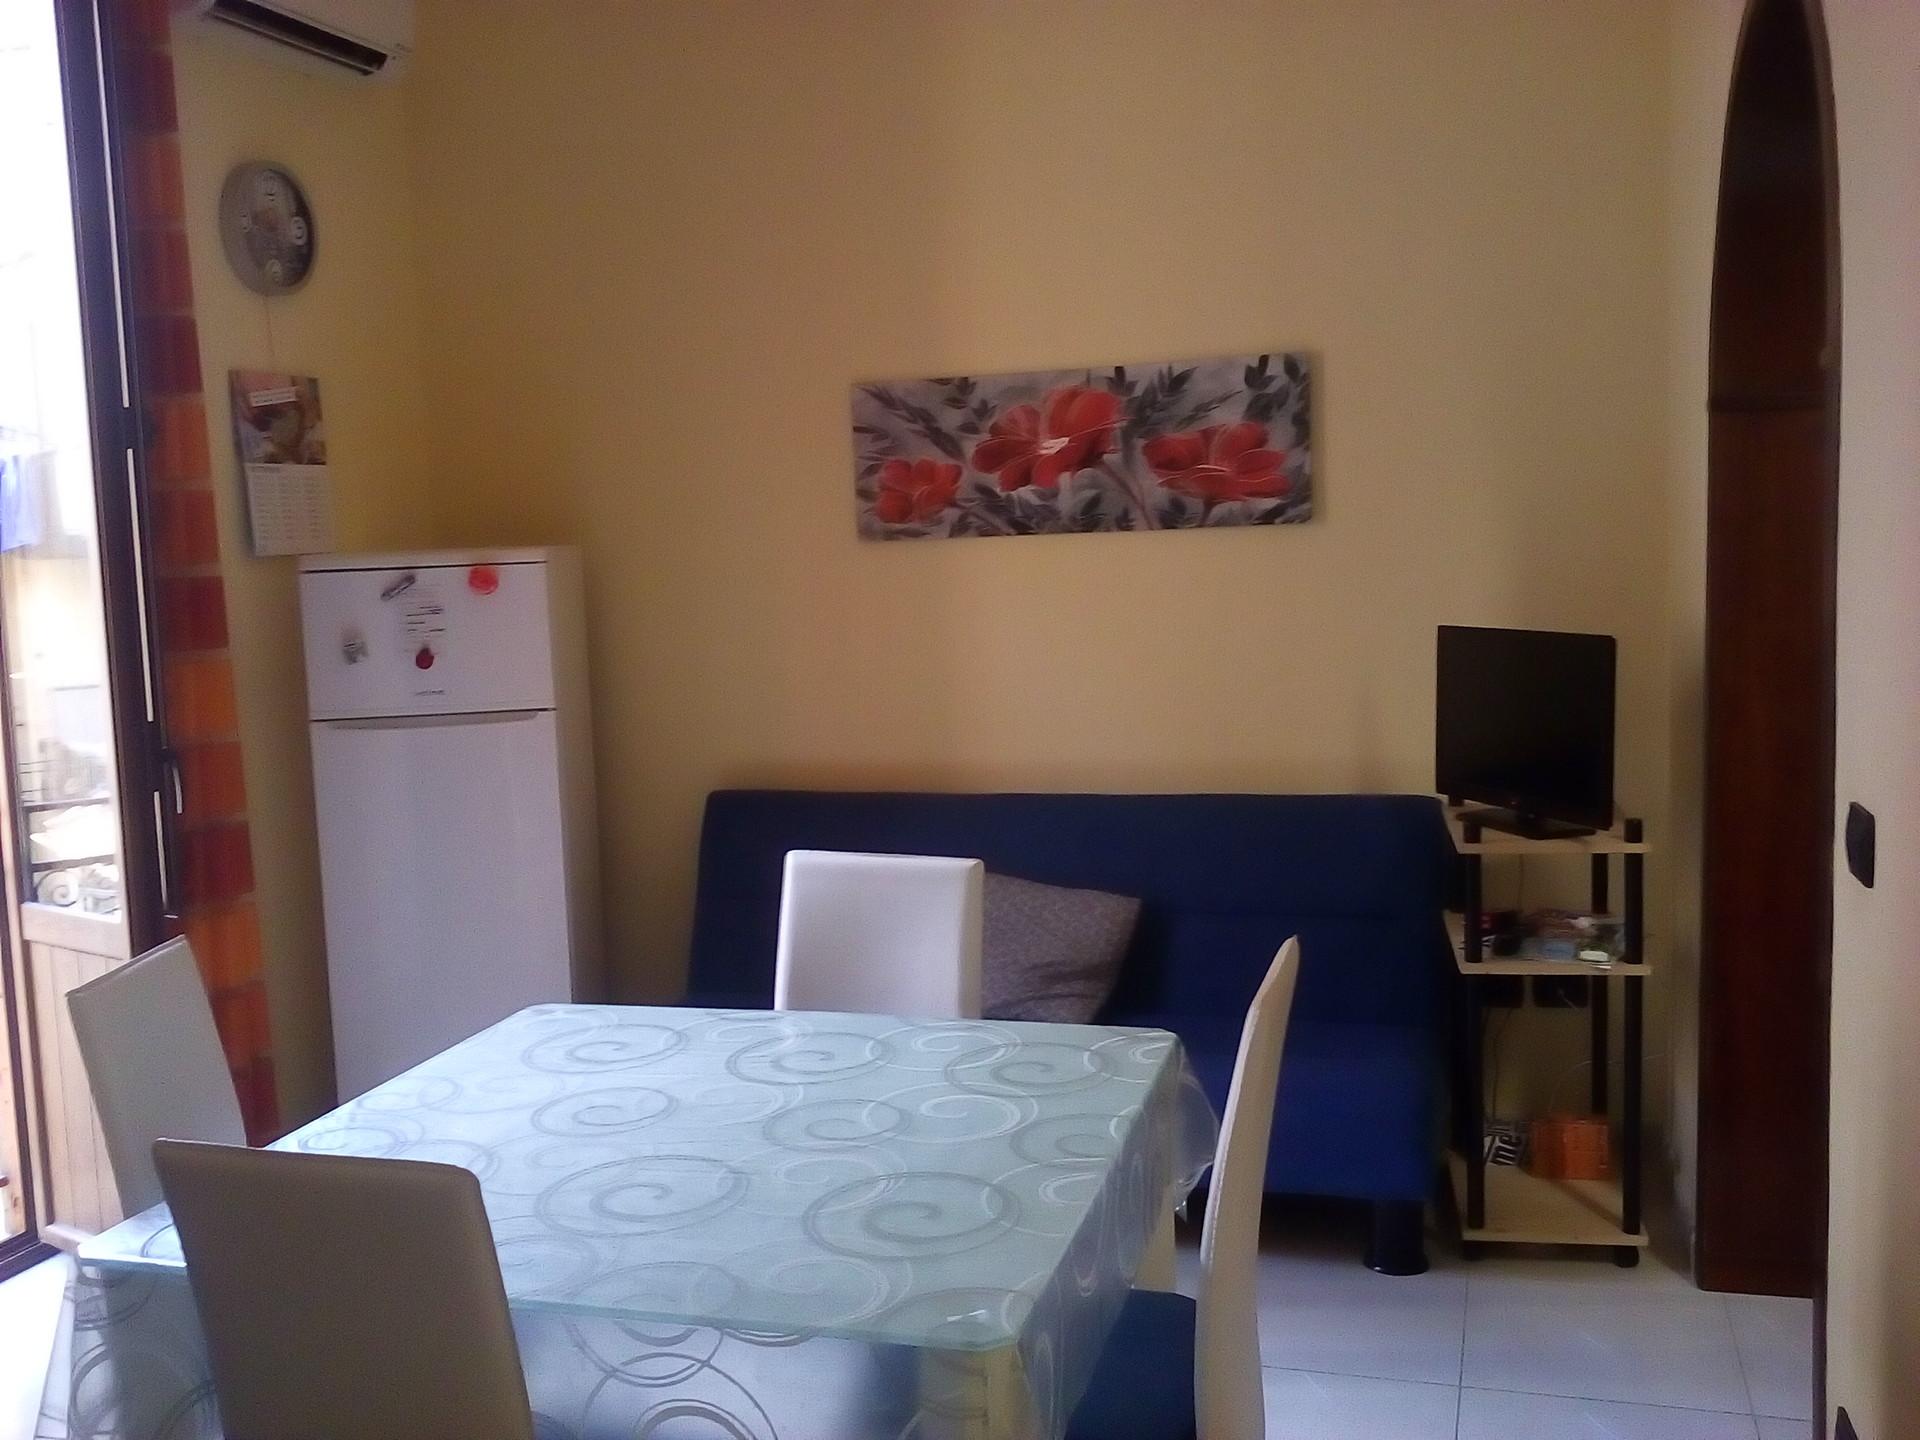 Via Mendola, 90, 90127 Palermo PA, Italy